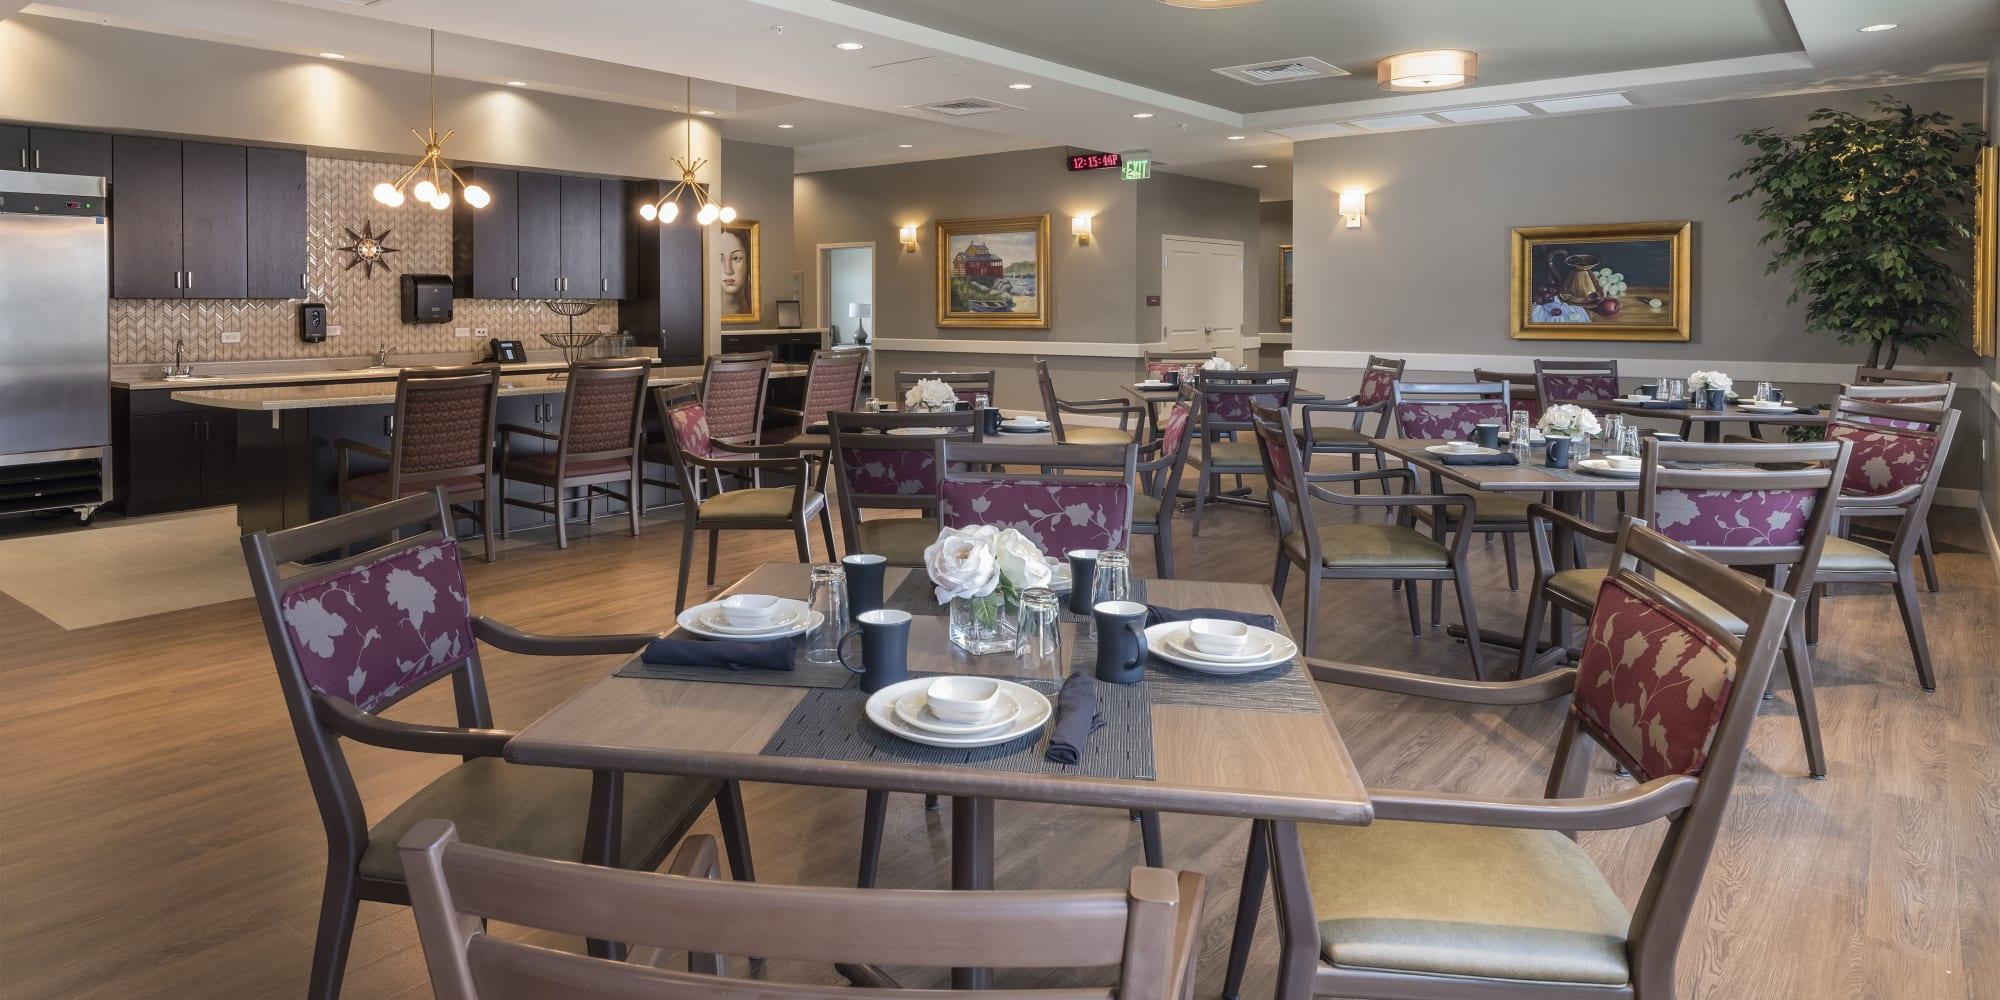 A large indoor dining room at Avenir Senior Living in Scottsdale, Arizona